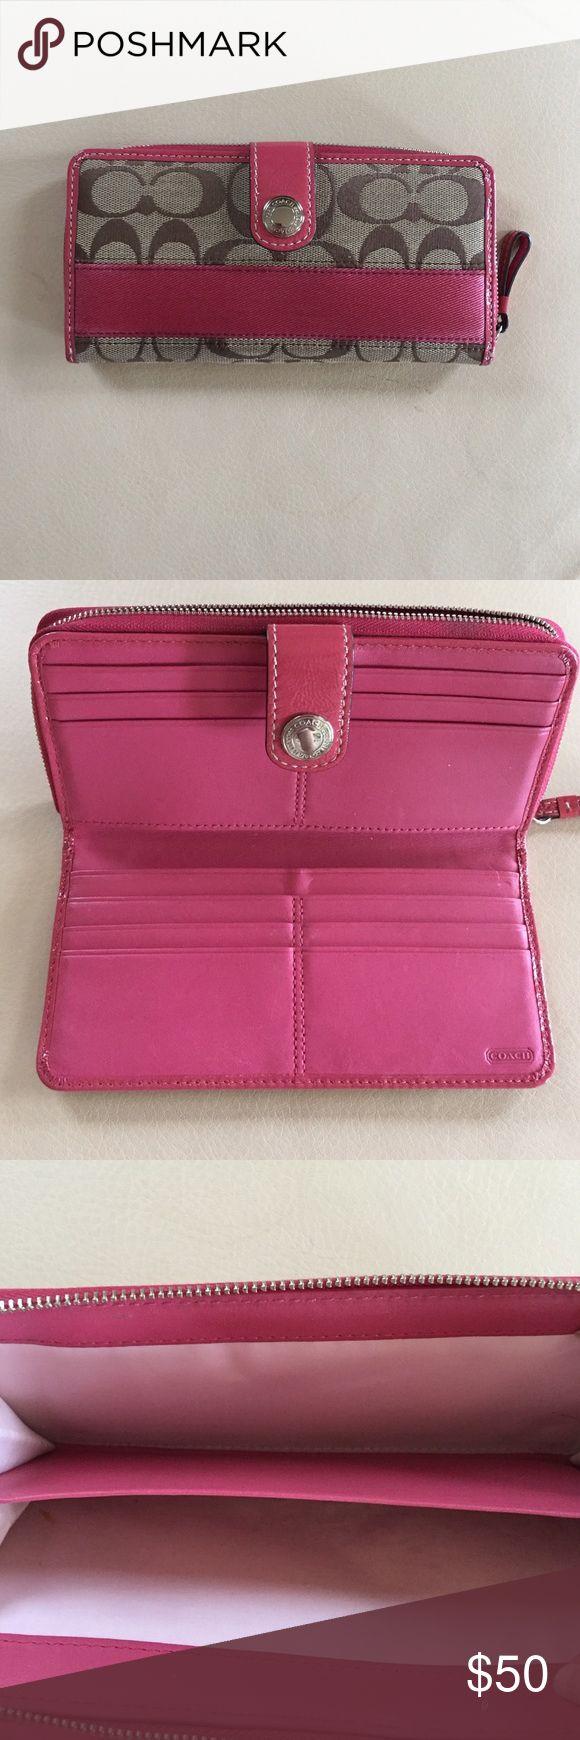 Coach wallet authenticsalenew price Like new authentic coach wallet Coach Bags Wallets